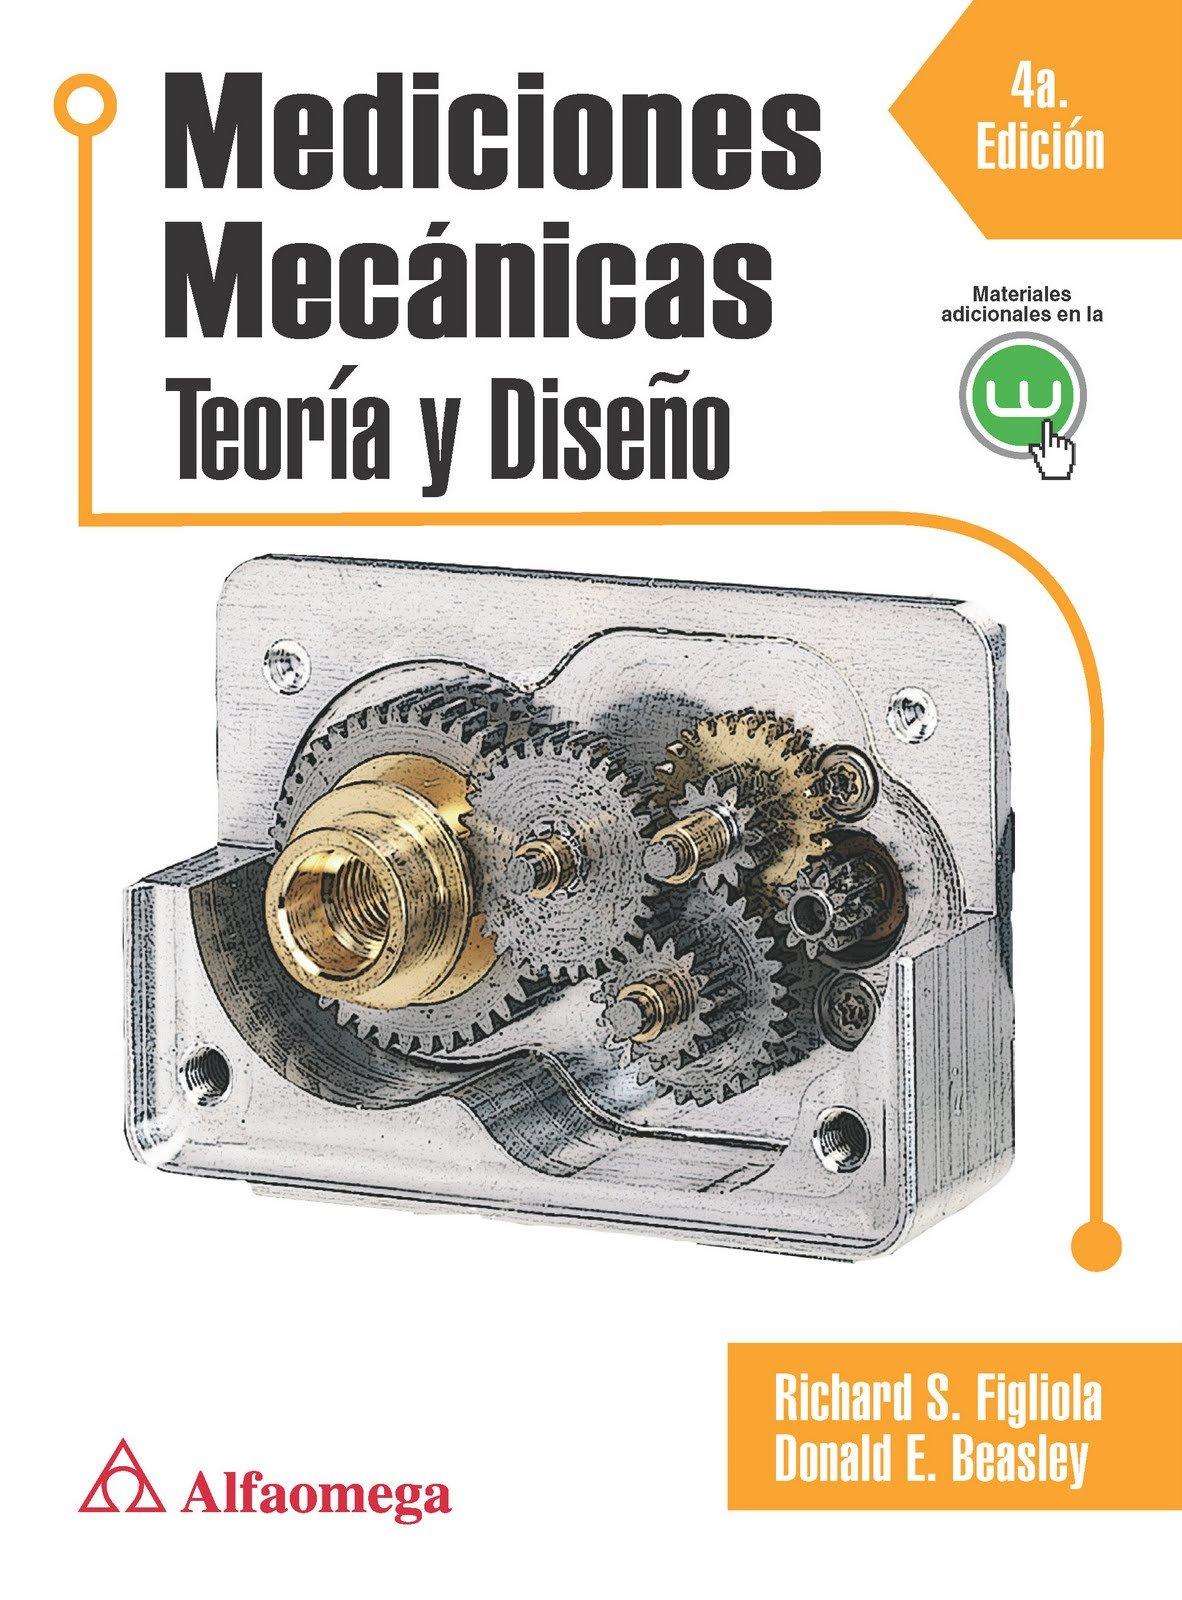 Mediciones Mecanicas, Teoria y Diseño (Spanish Edition): Richard S. FIGLIOLA, Donald E. BEASLEY, Alfaomega Grupo Editor (MX), ...